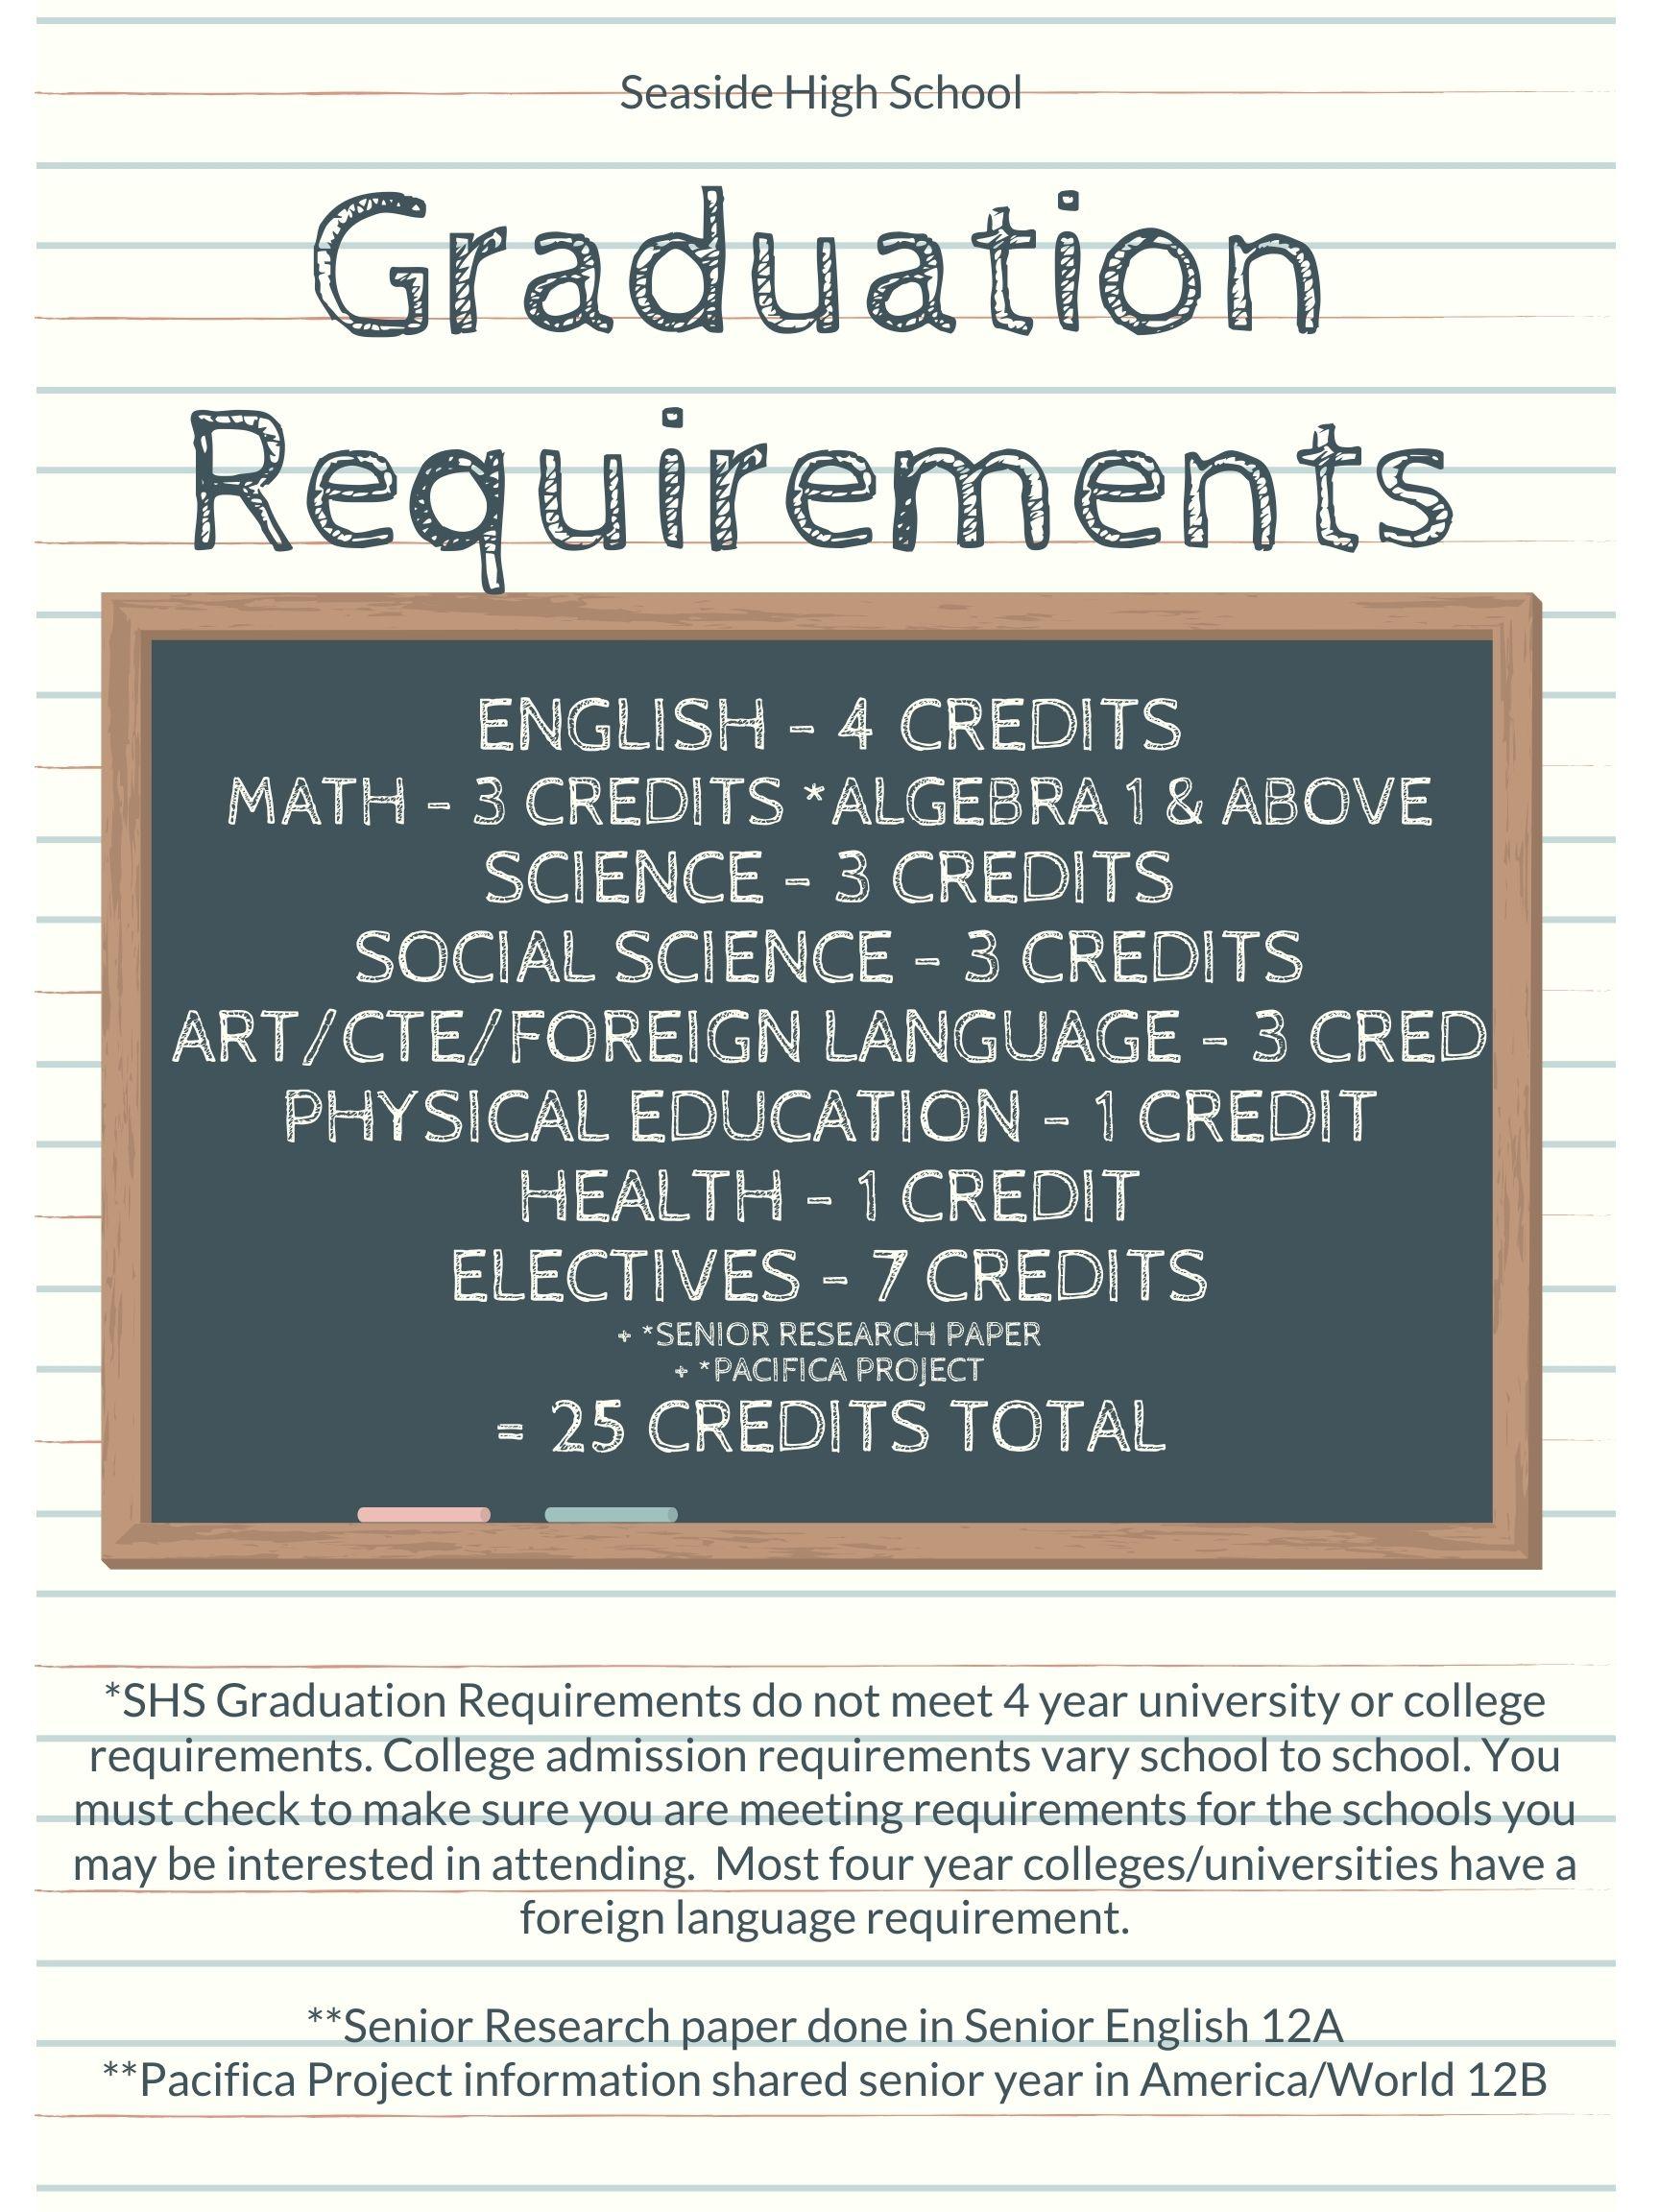 SHS Graduation Requirements